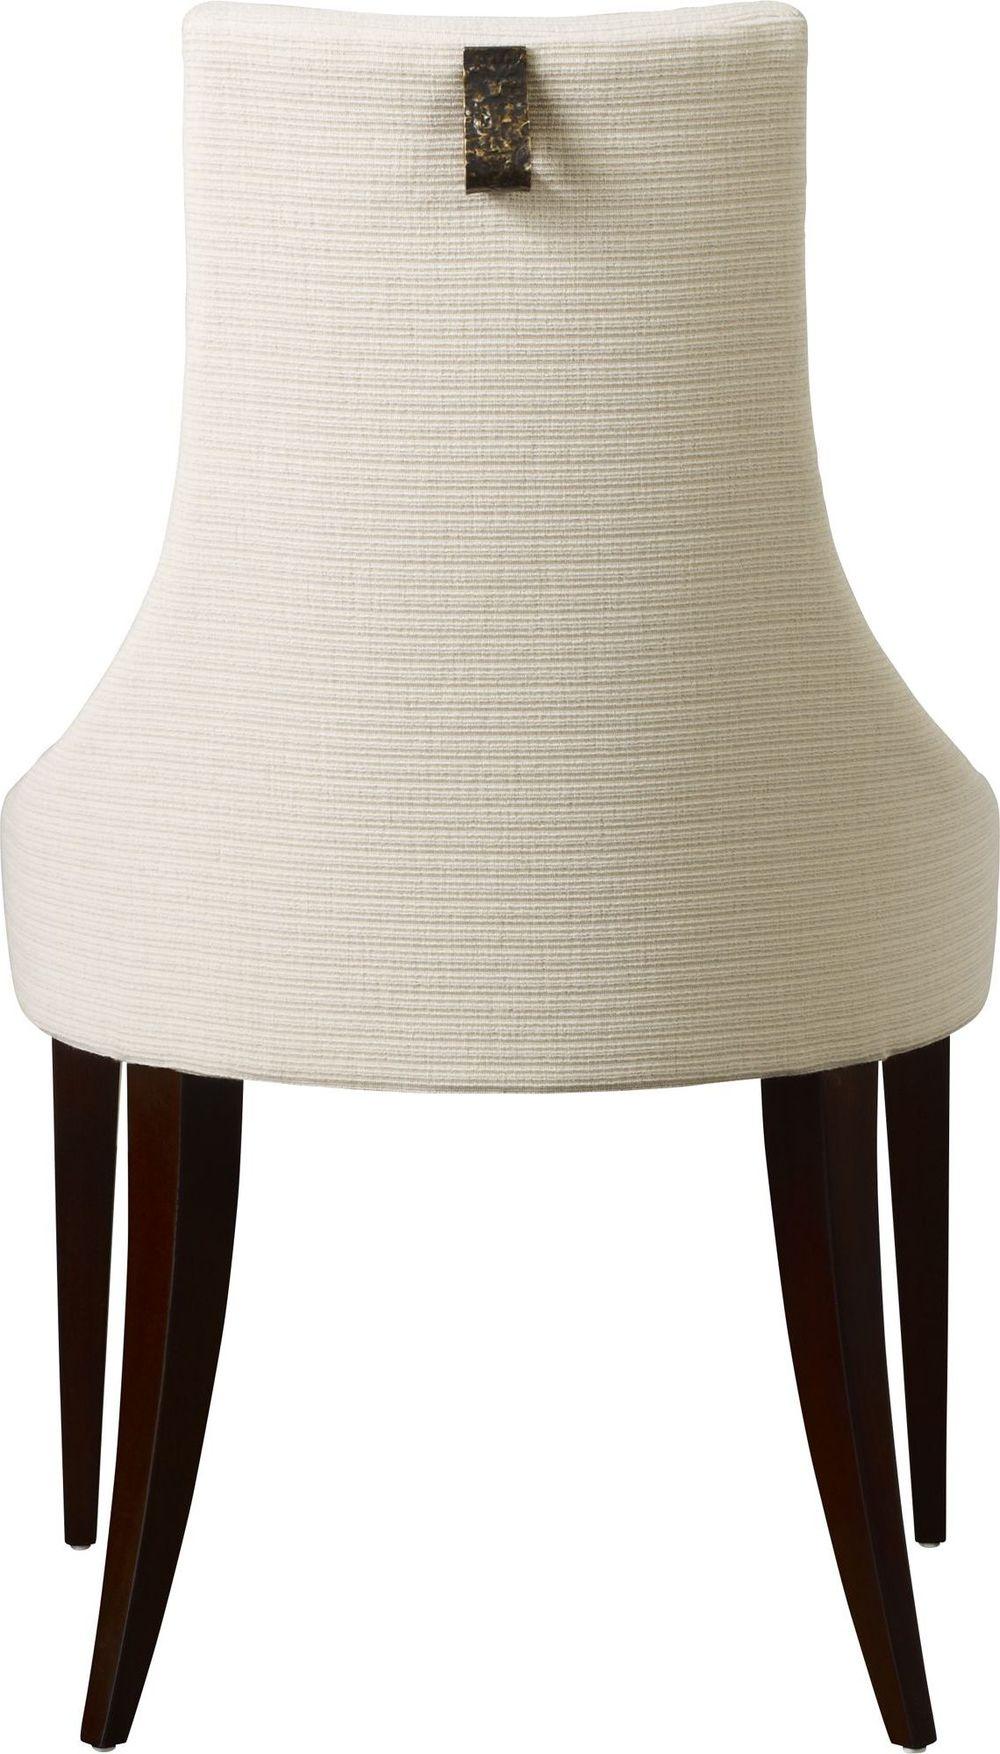 Baker Furniture - Shell Side Chair